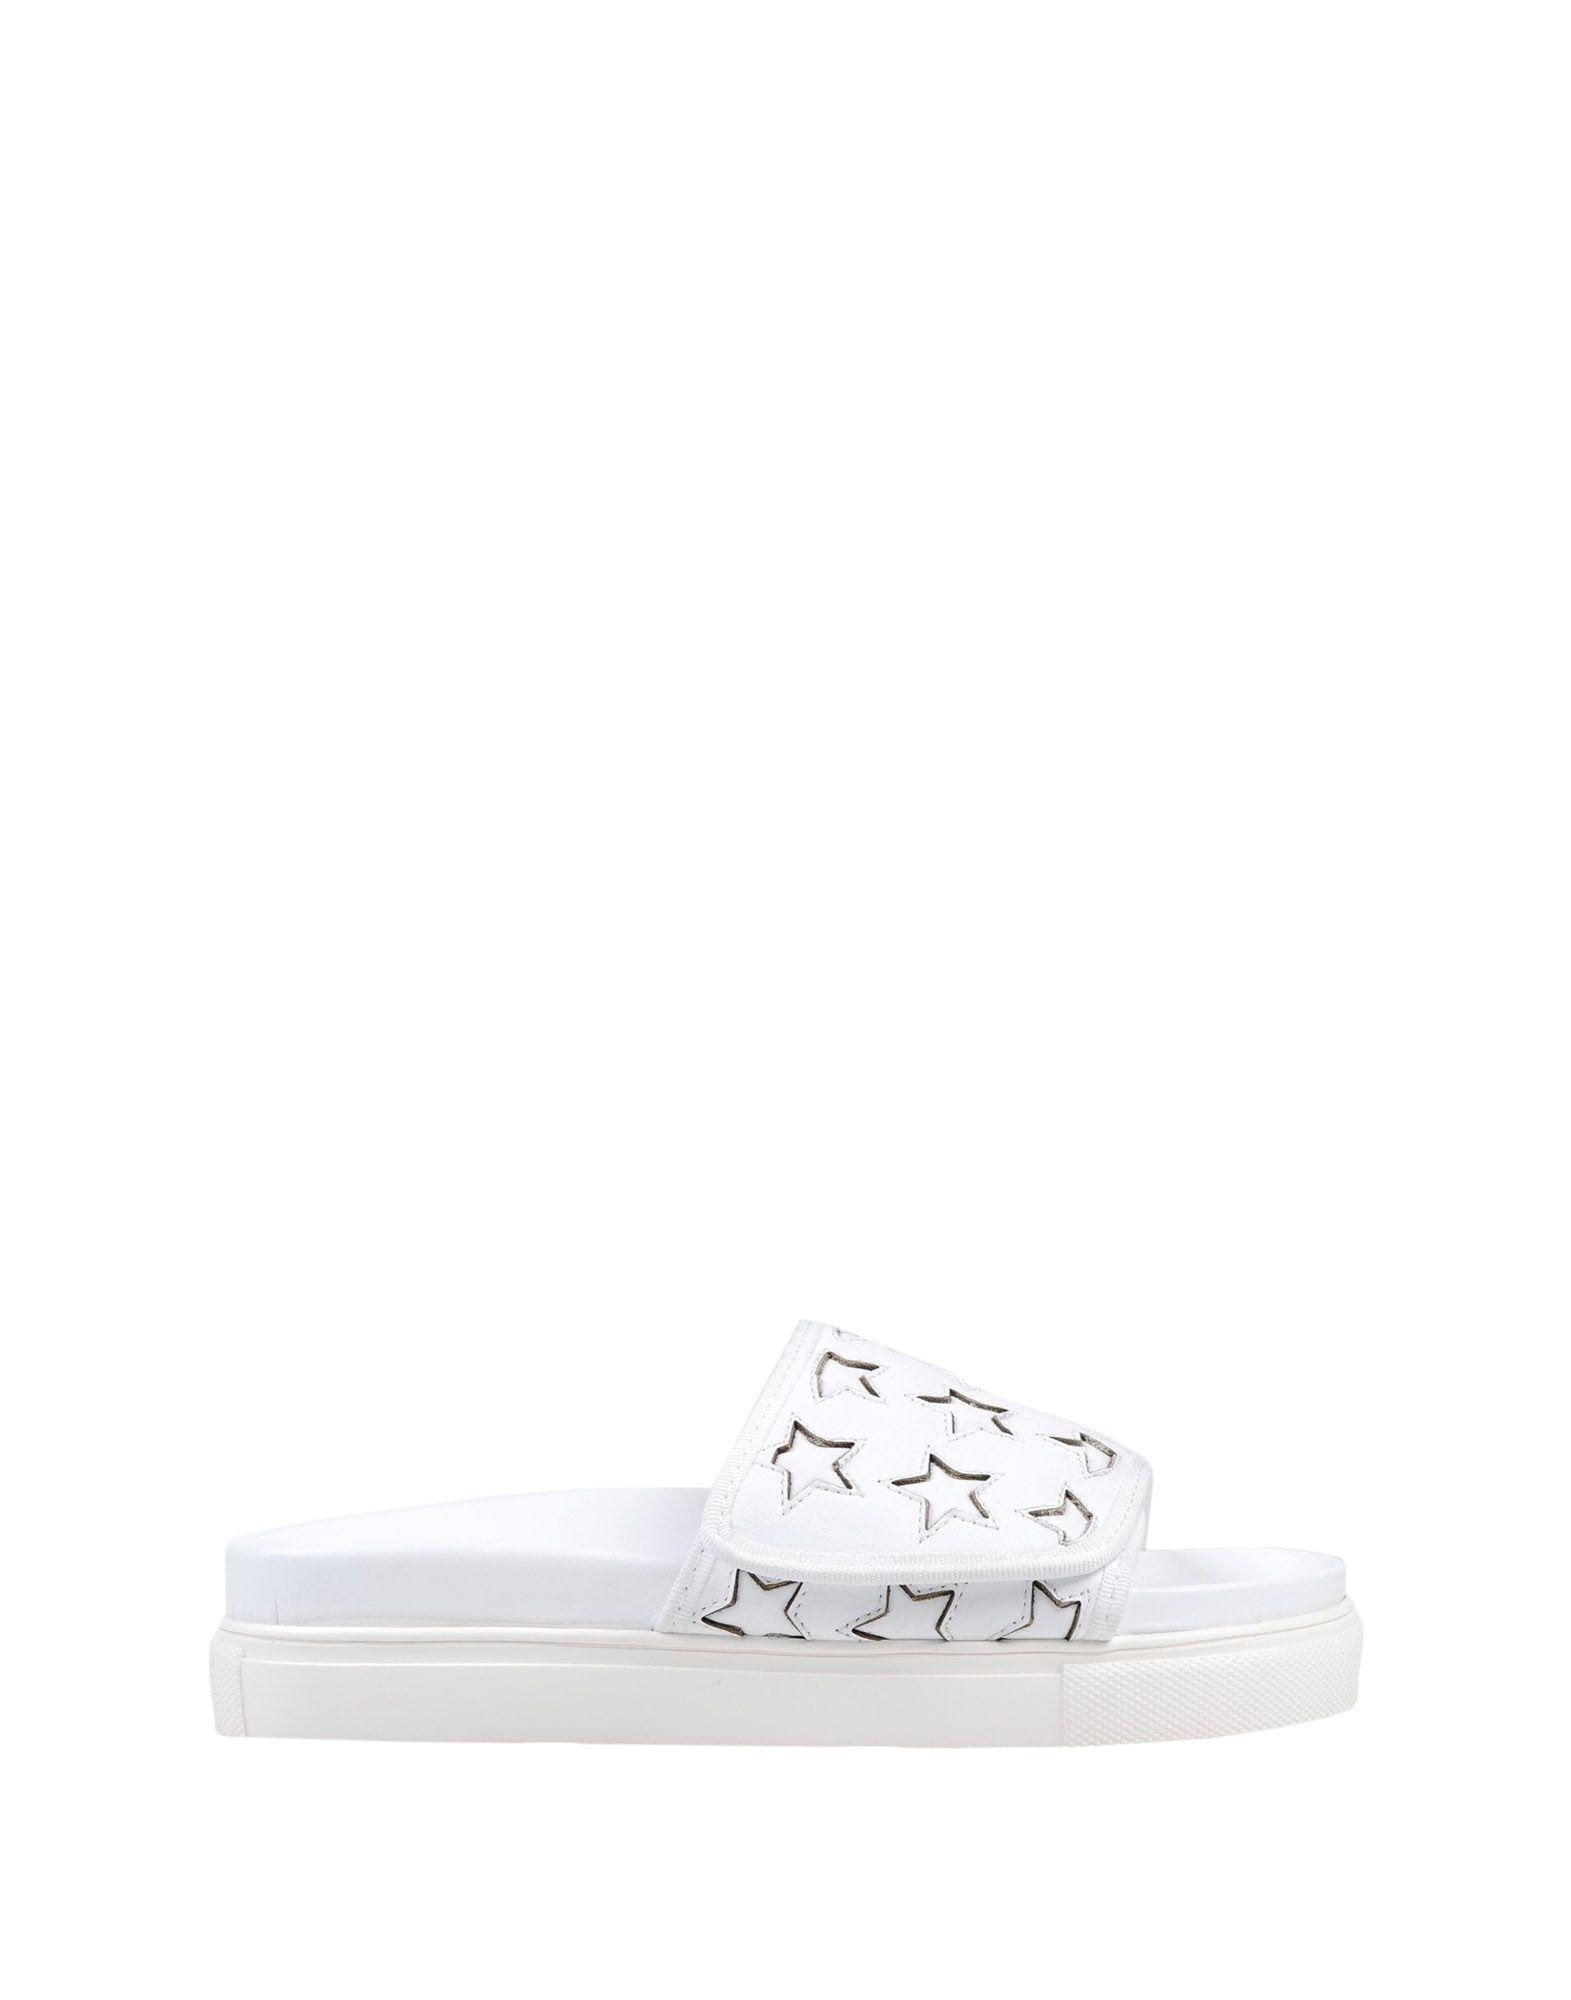 Stilvolle Stilvolle Stilvolle billige Schuhe N° 21 Sandalen Damen  11412983GW d5eaba